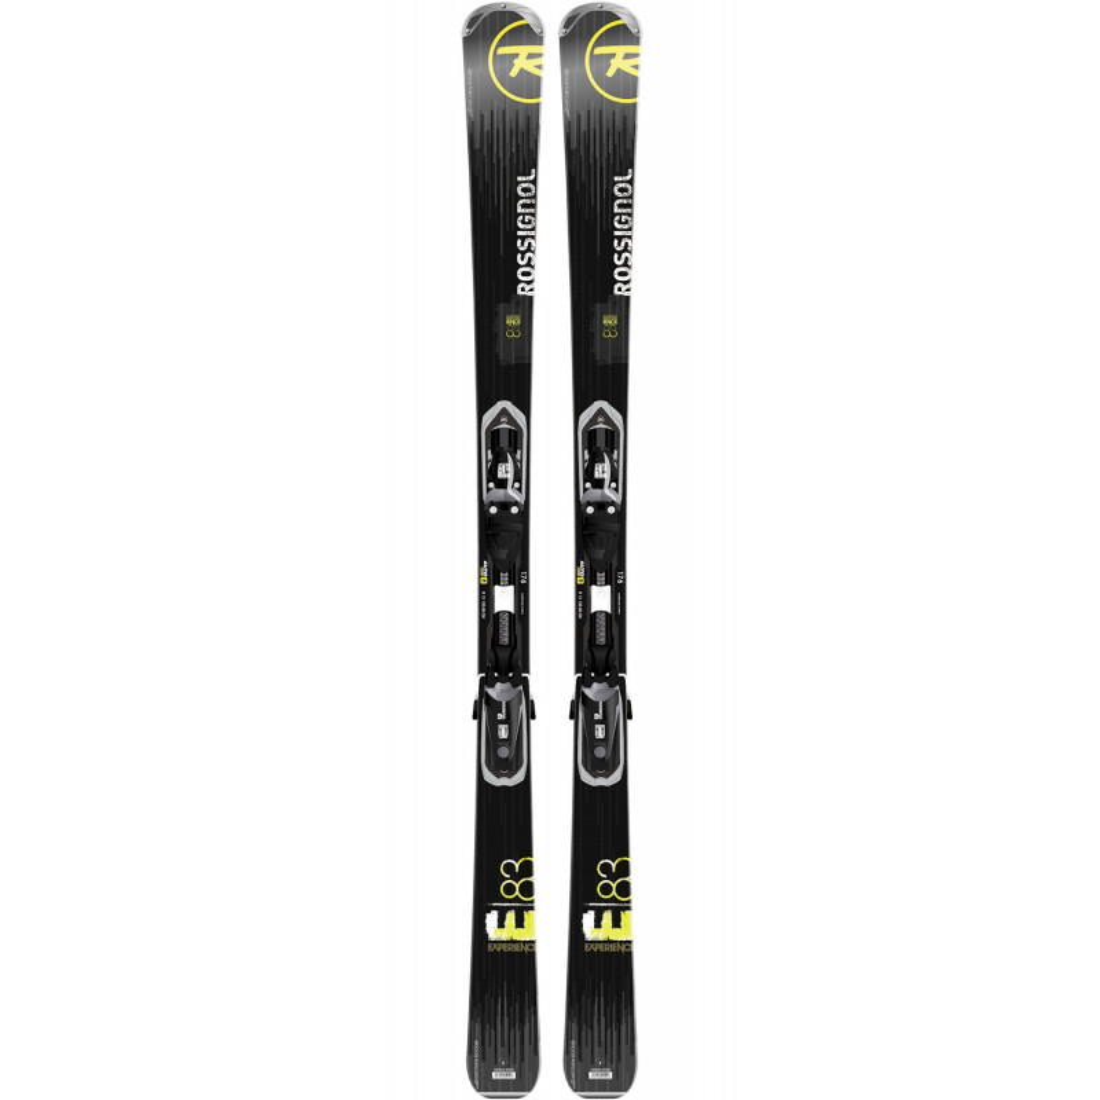 housse ski rossignol - 28 images - ski bags housse basic ...